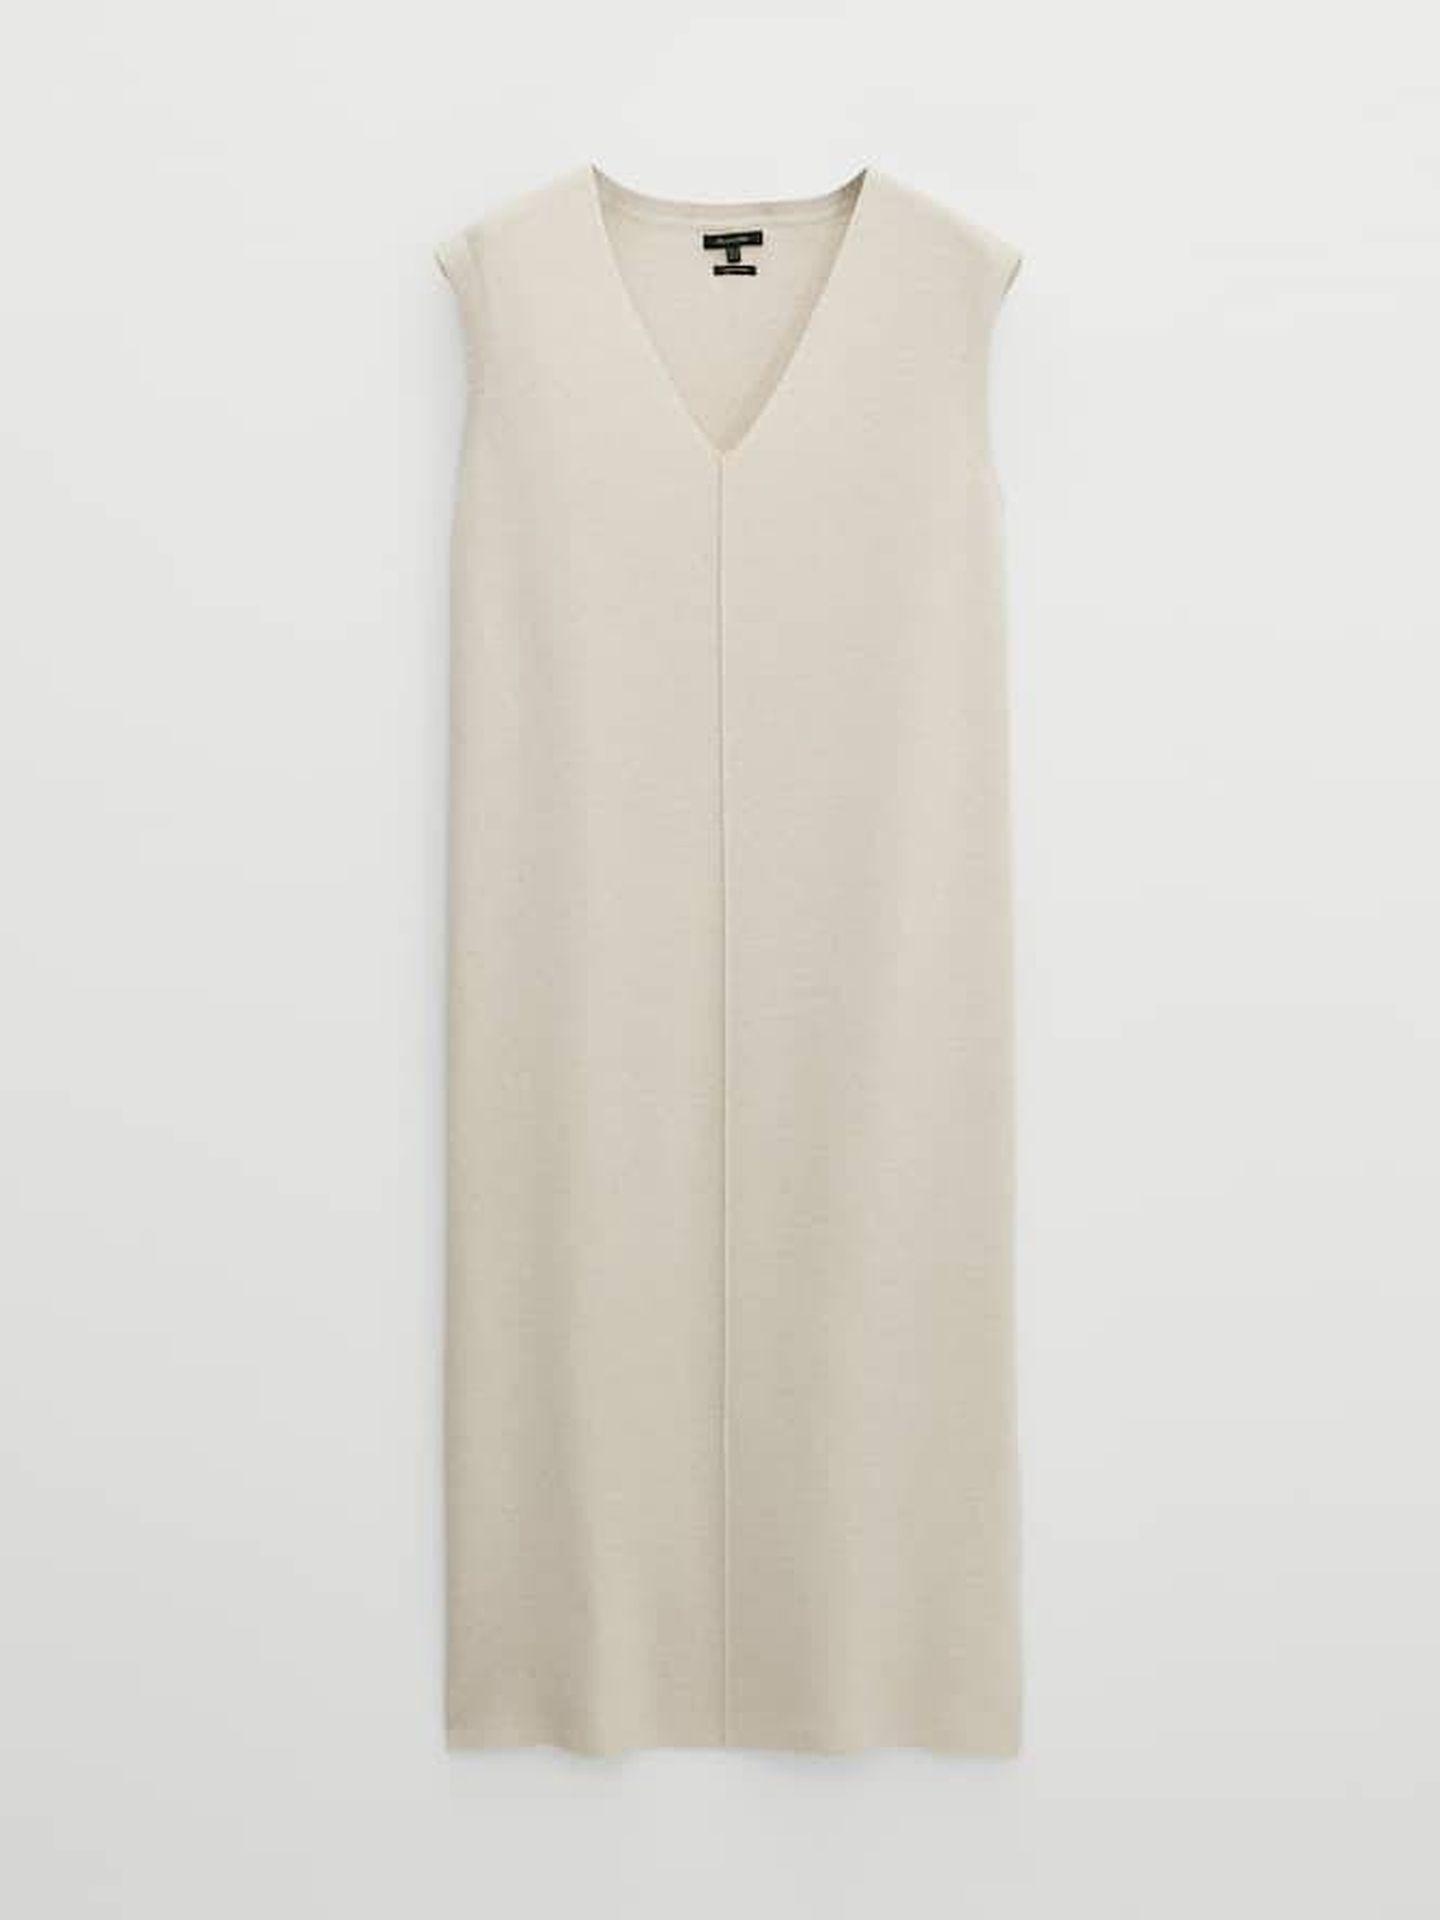 Vestido de punto de Massimo Dutti. (Cortesía)